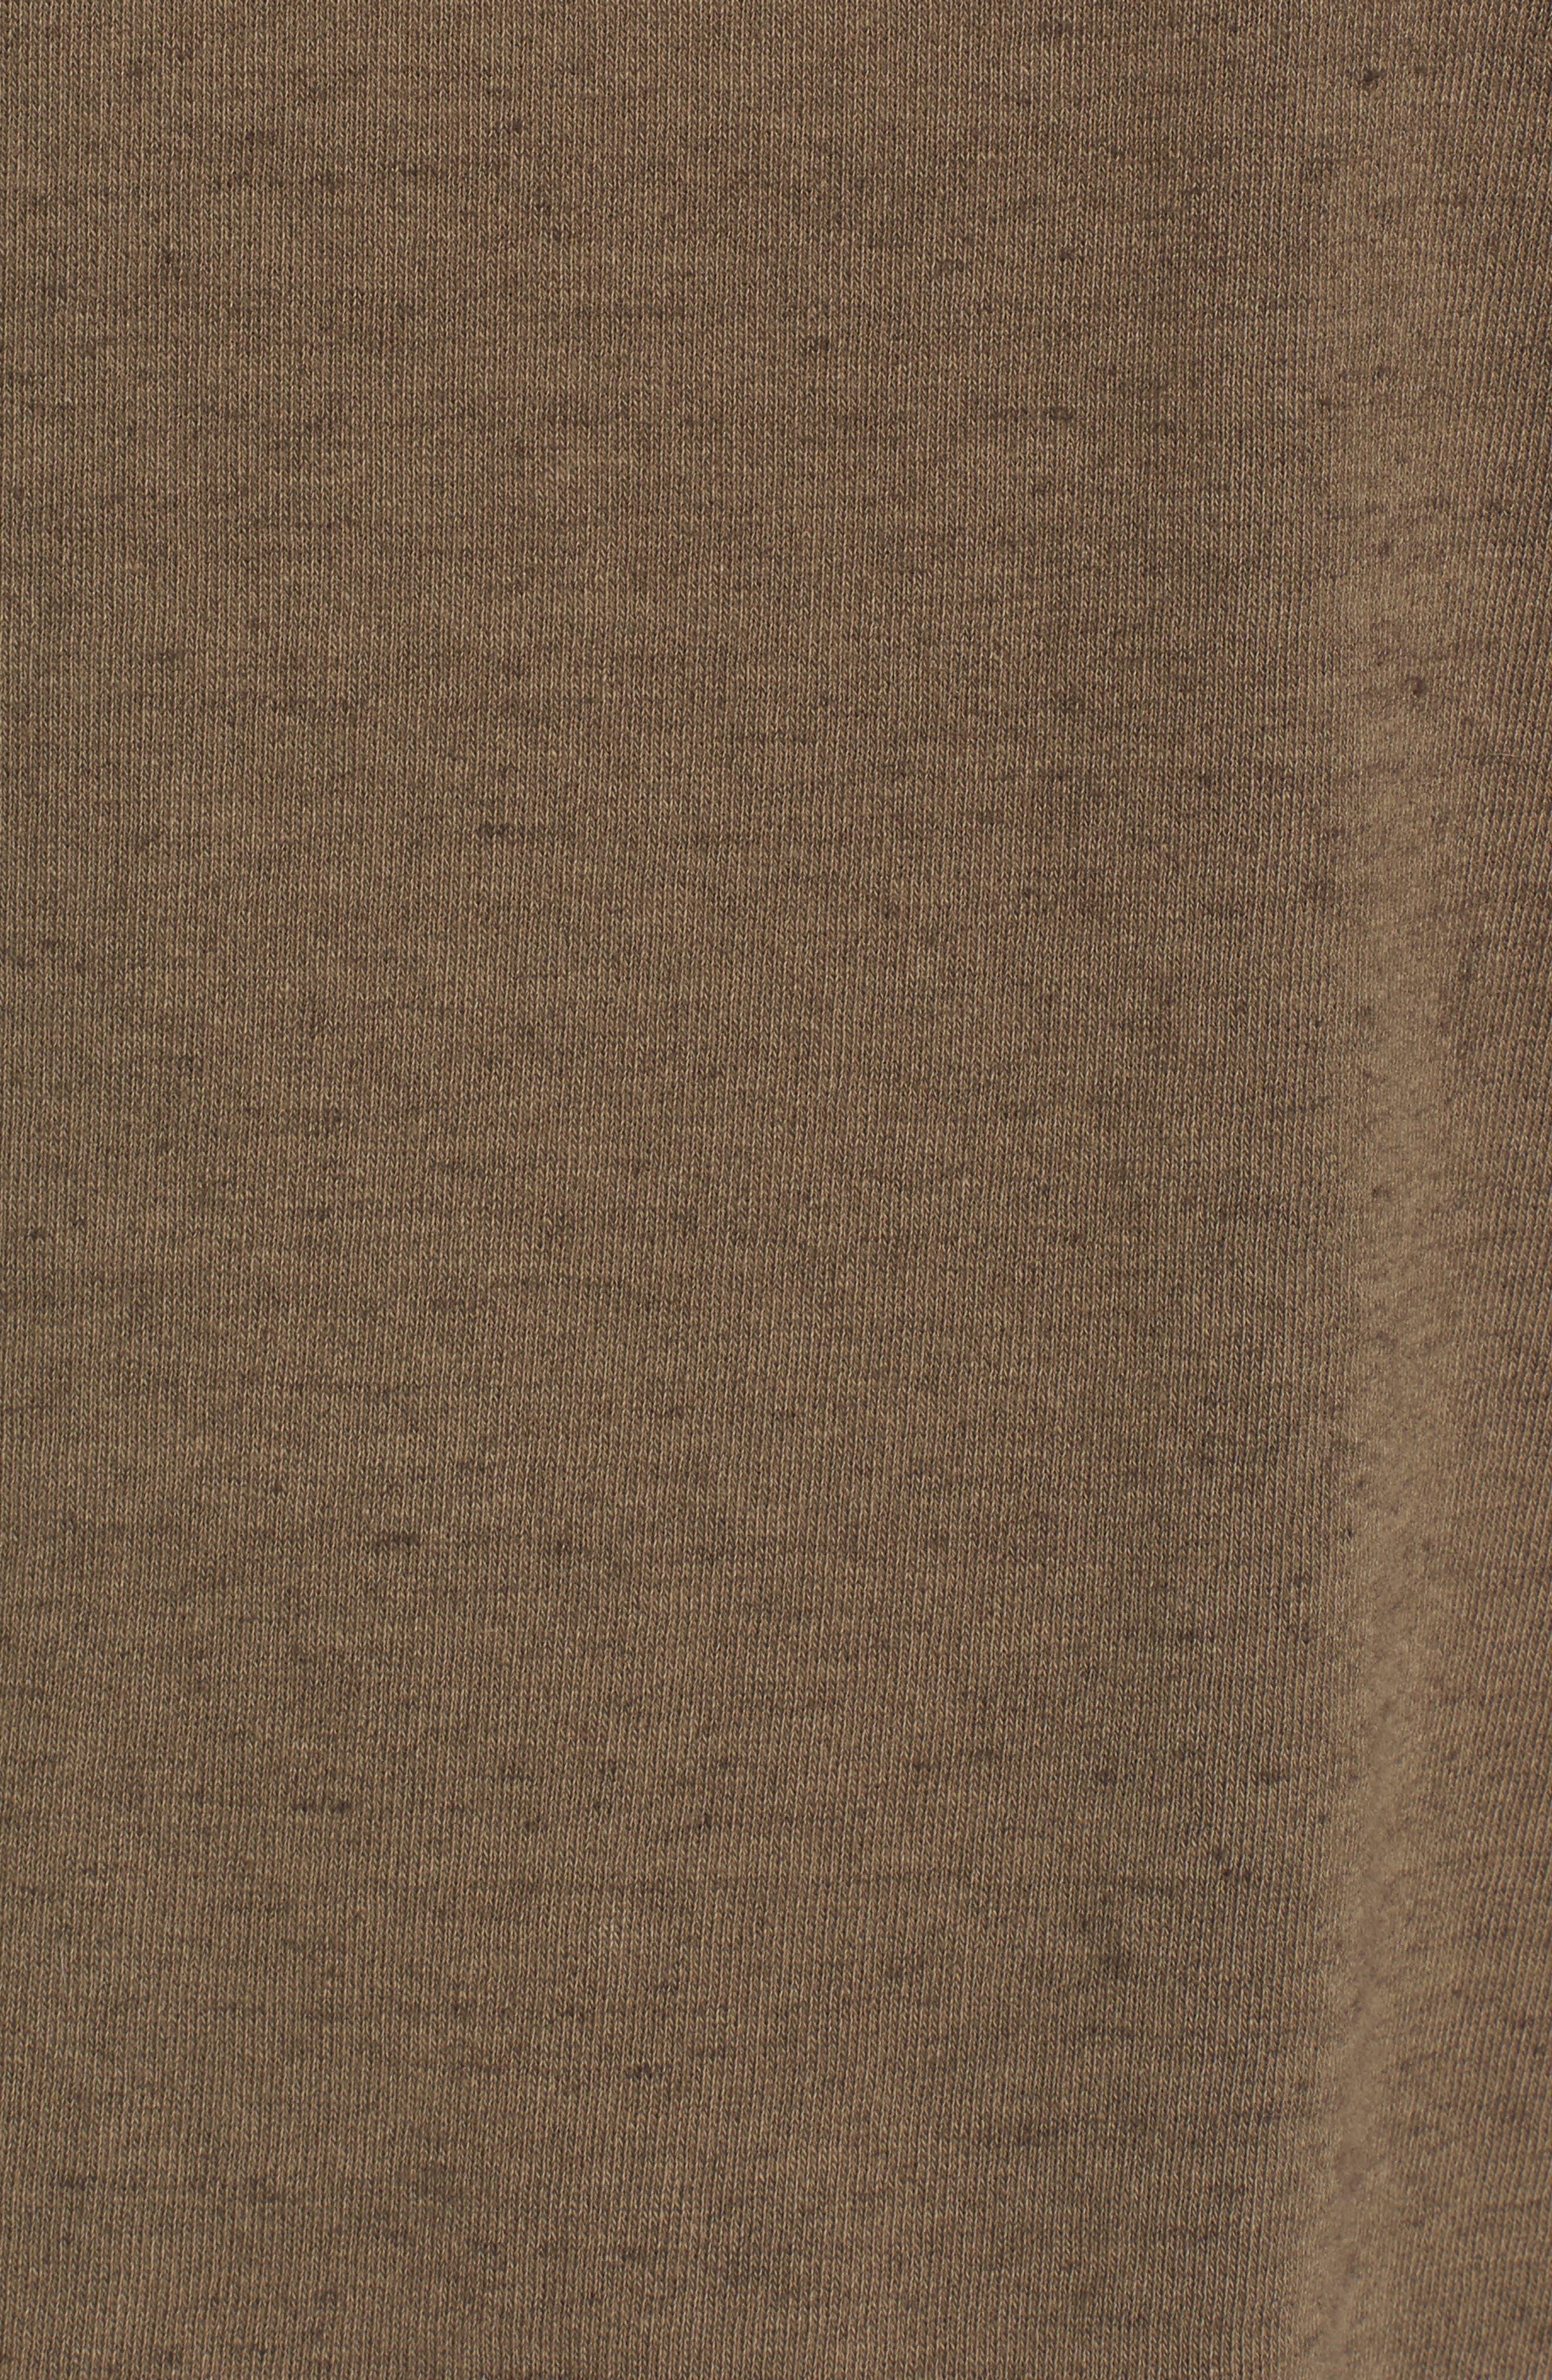 Alternate Image 5  - James Perse Vintage Sweatshirt Tee